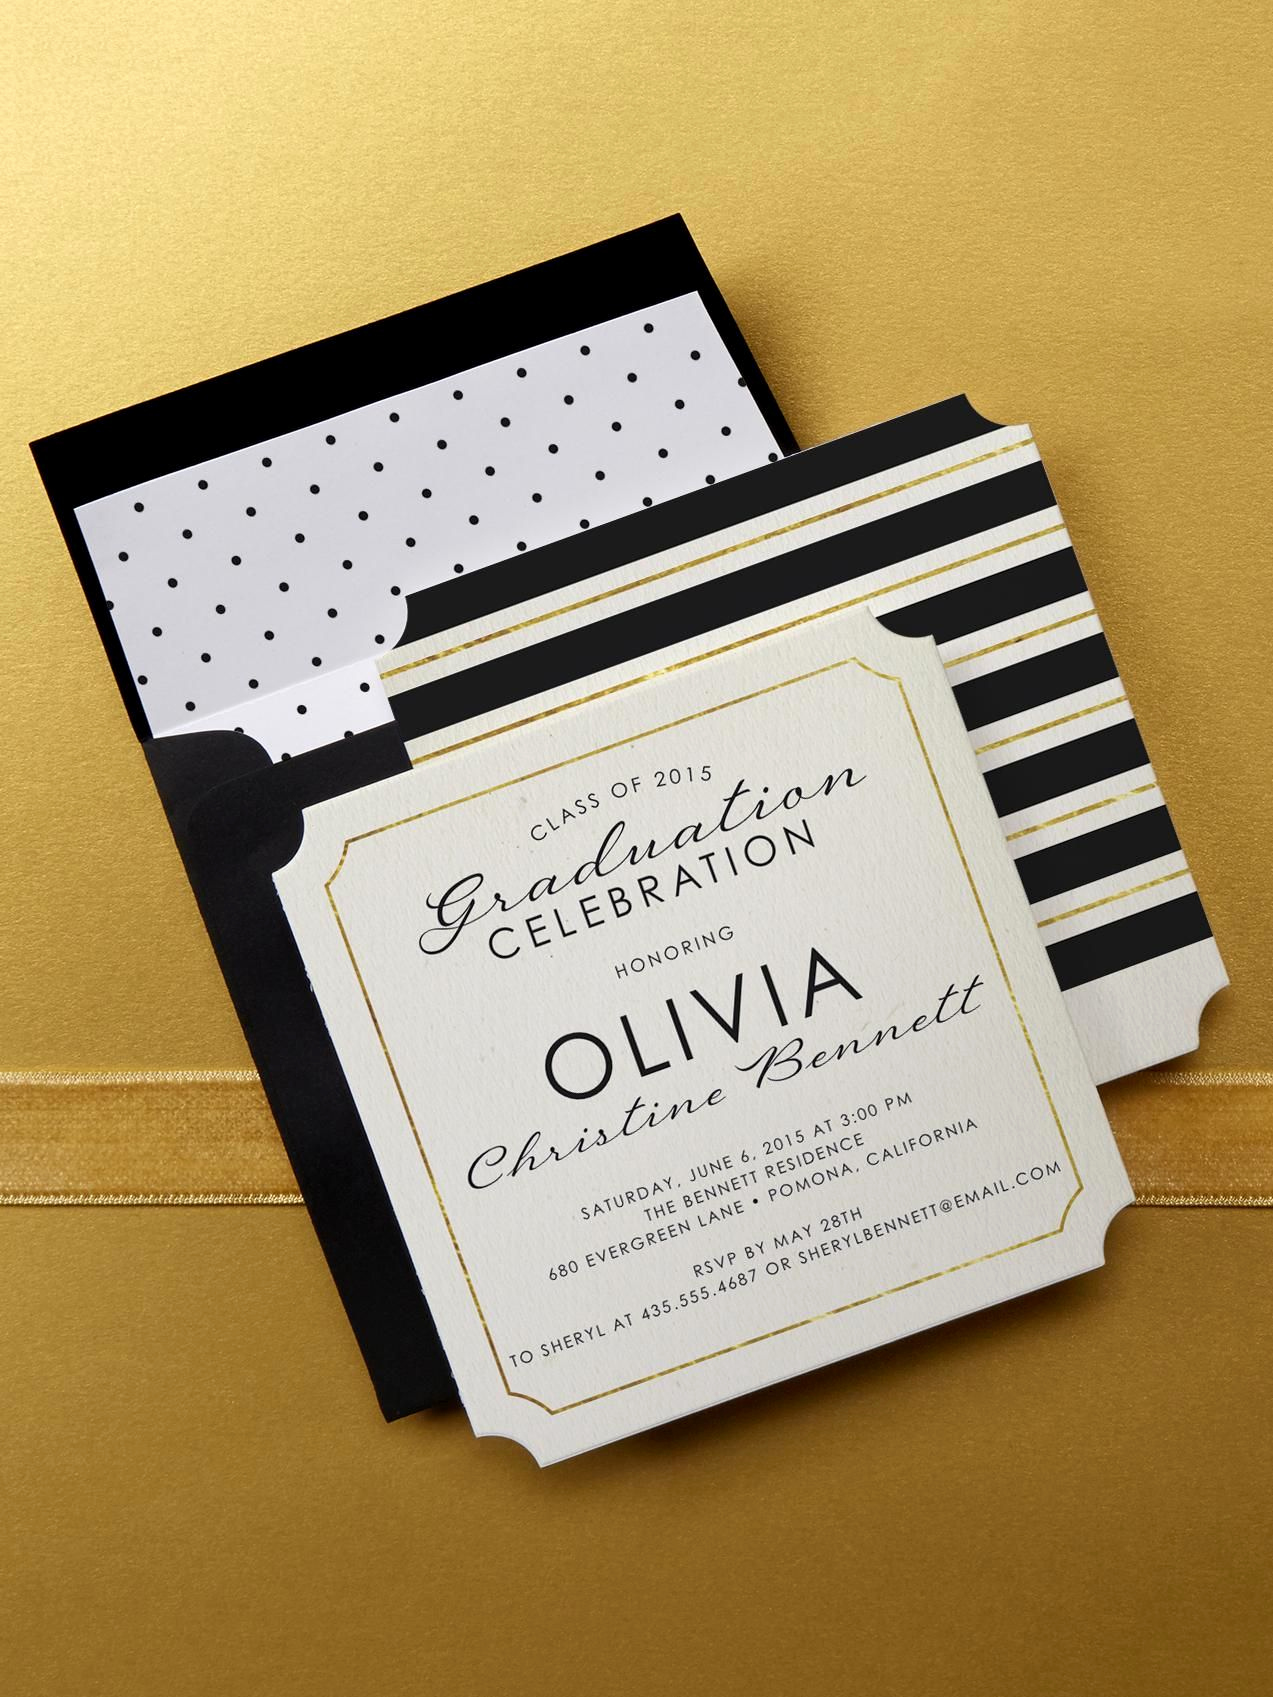 Homemade Graduation Invitation Ideas Awesome Choose A Linen Graduation Invitation Design at Tiny Prints